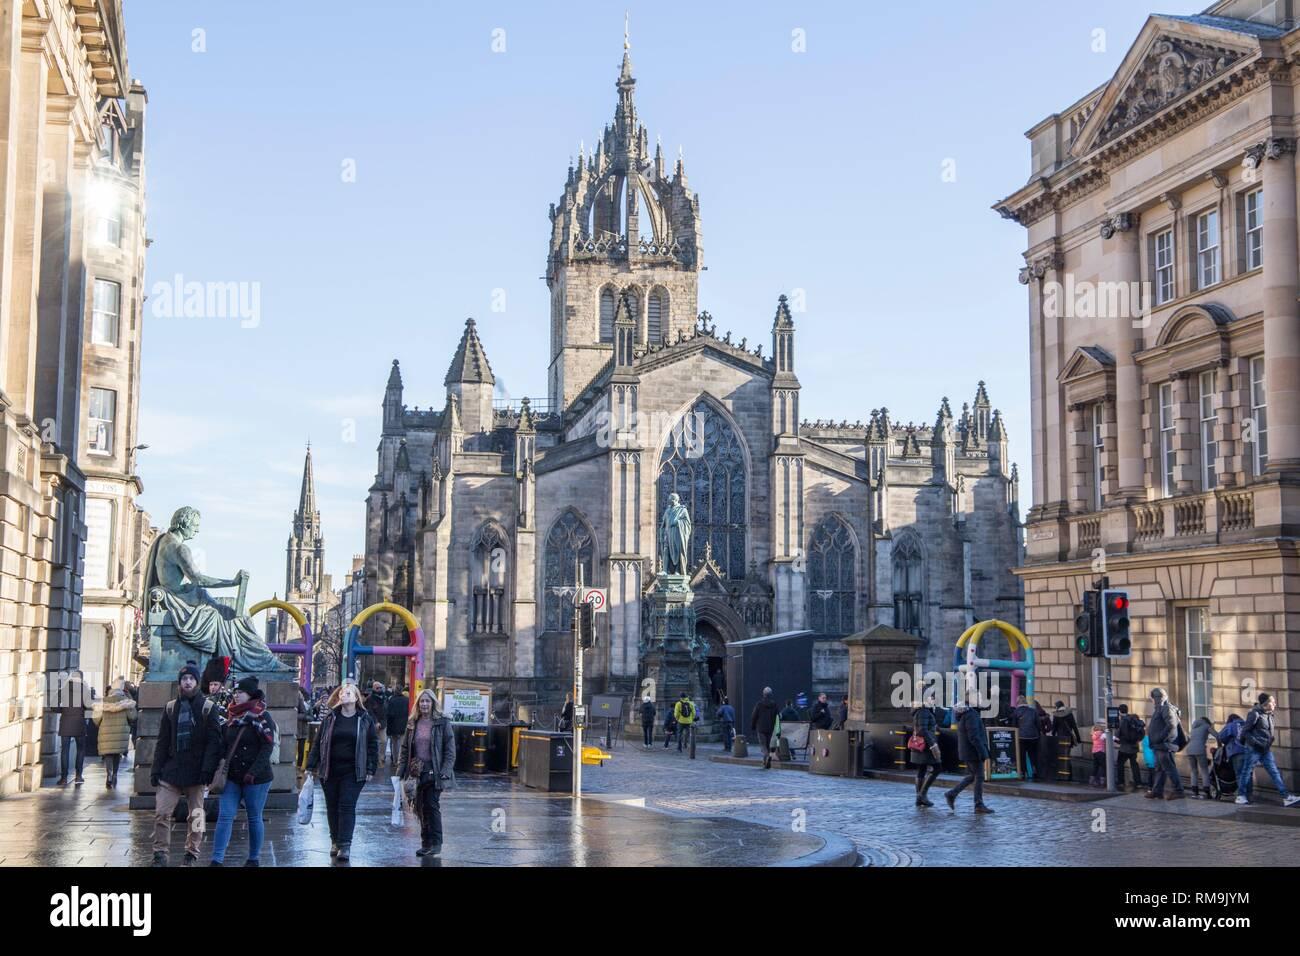 View down the Royal Mile, Edinburgh, Scotland, UK. Stock Photo